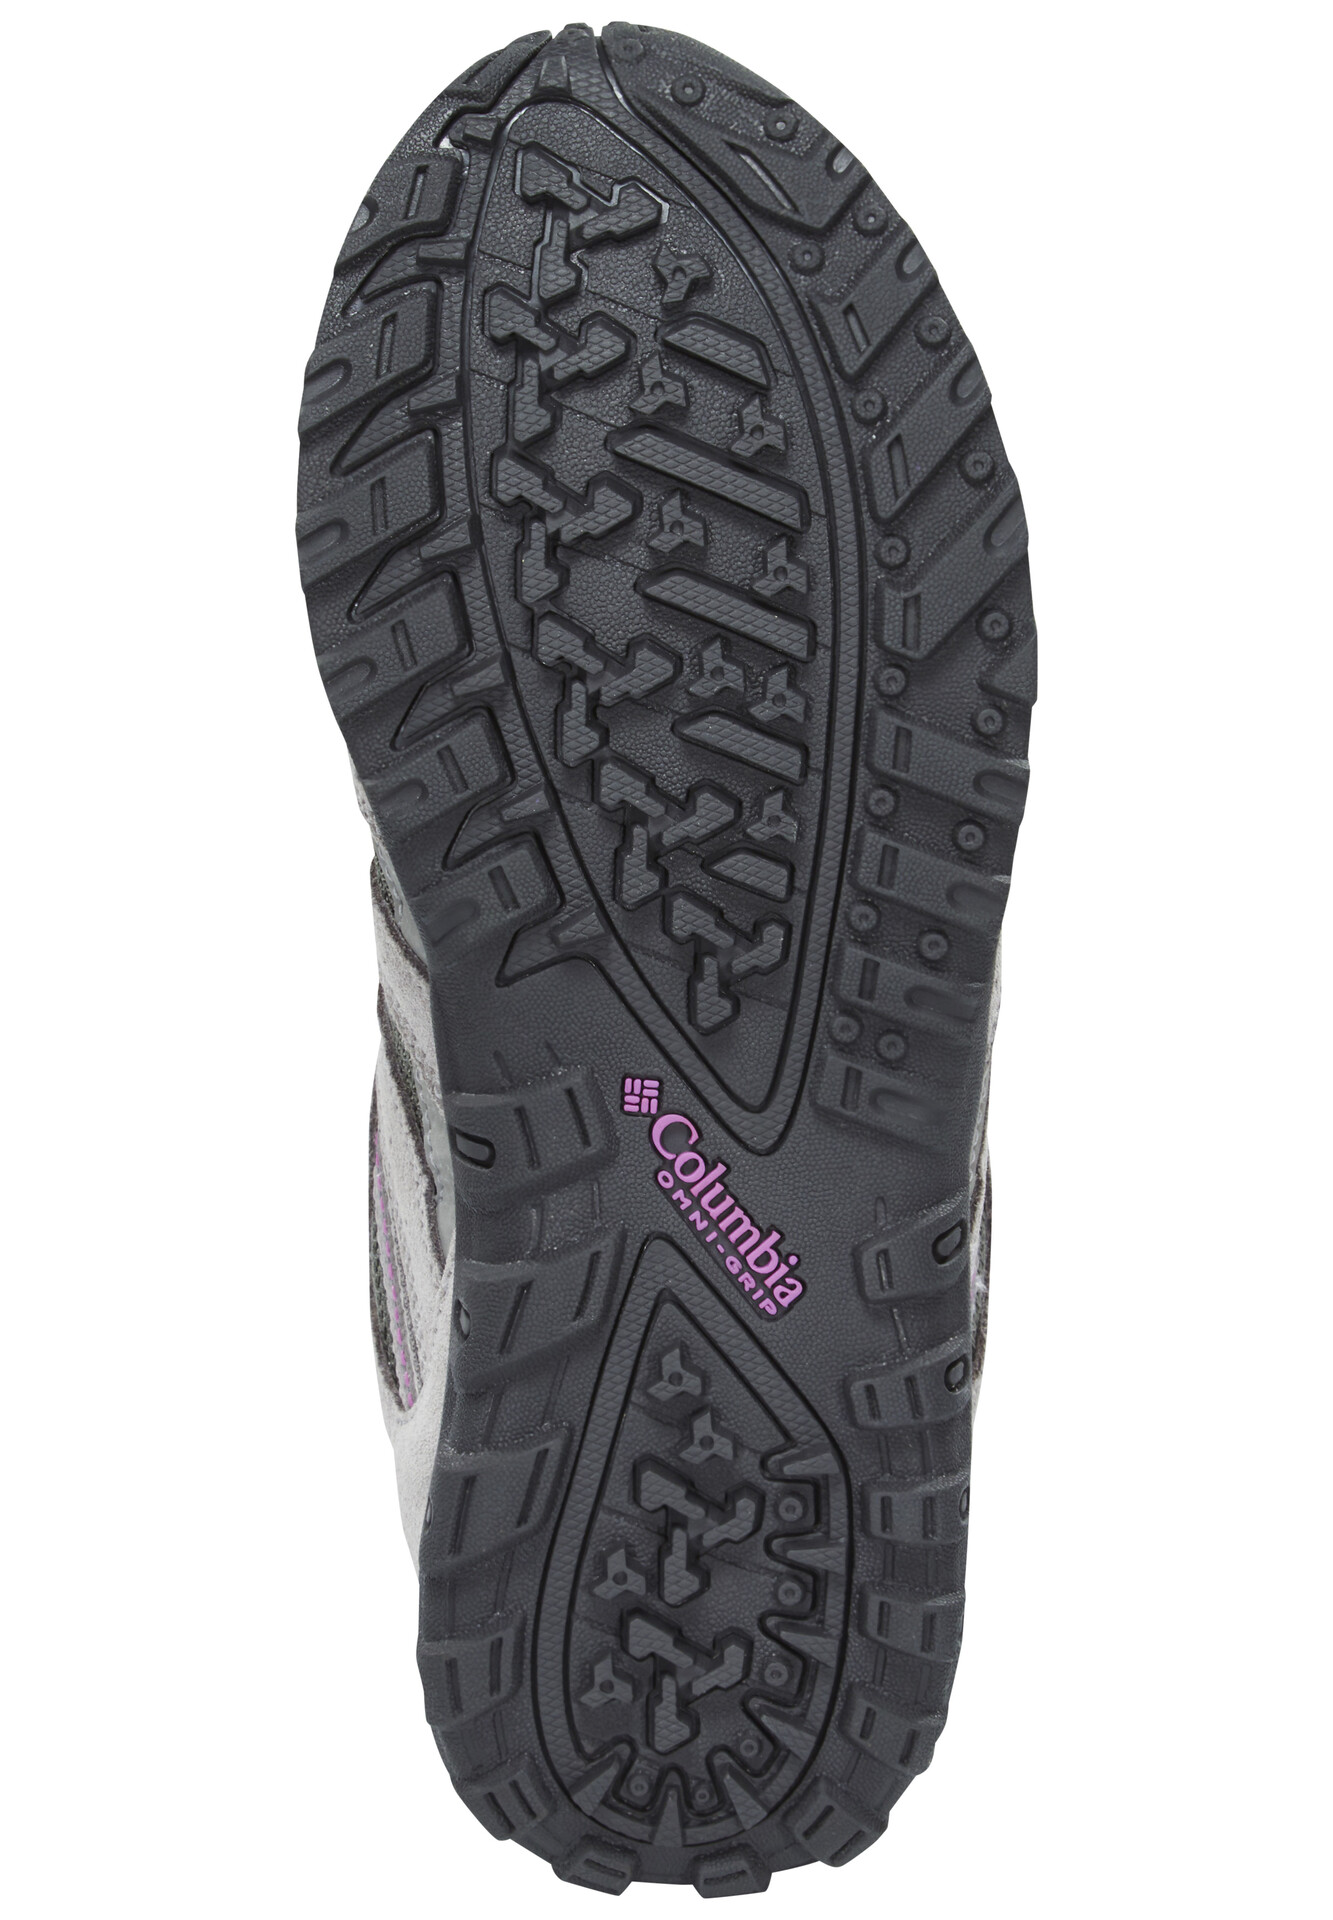 À FemmeCharcoal Razzle Waterproof Basse Chaussures Columbia Redmond Tige qjc4AR35L